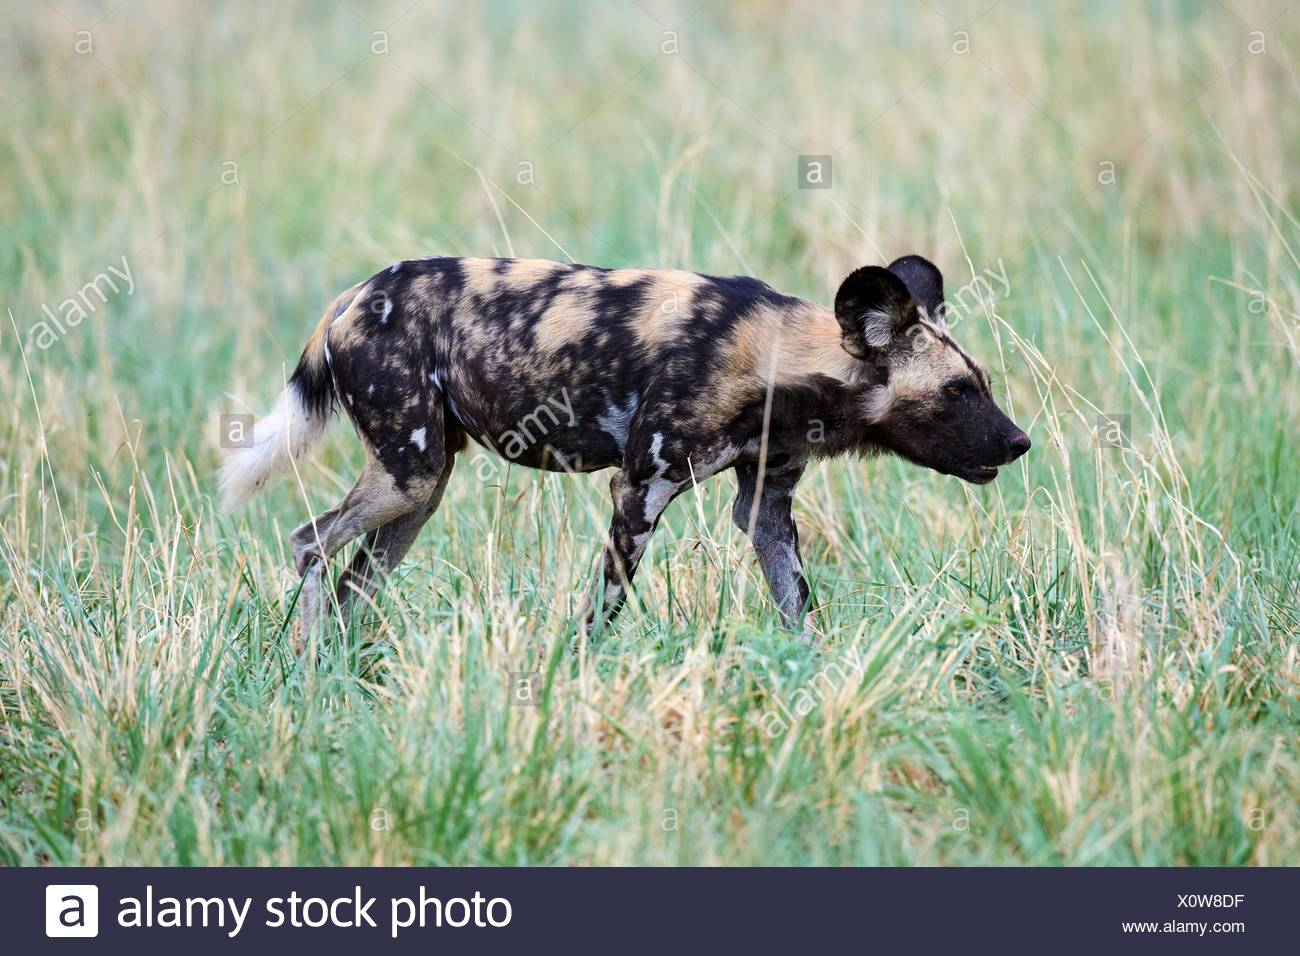 African wild dog (Lycaon pictus) walking in savanna. Hwange National Park, Zimbabwe. Stock Photo